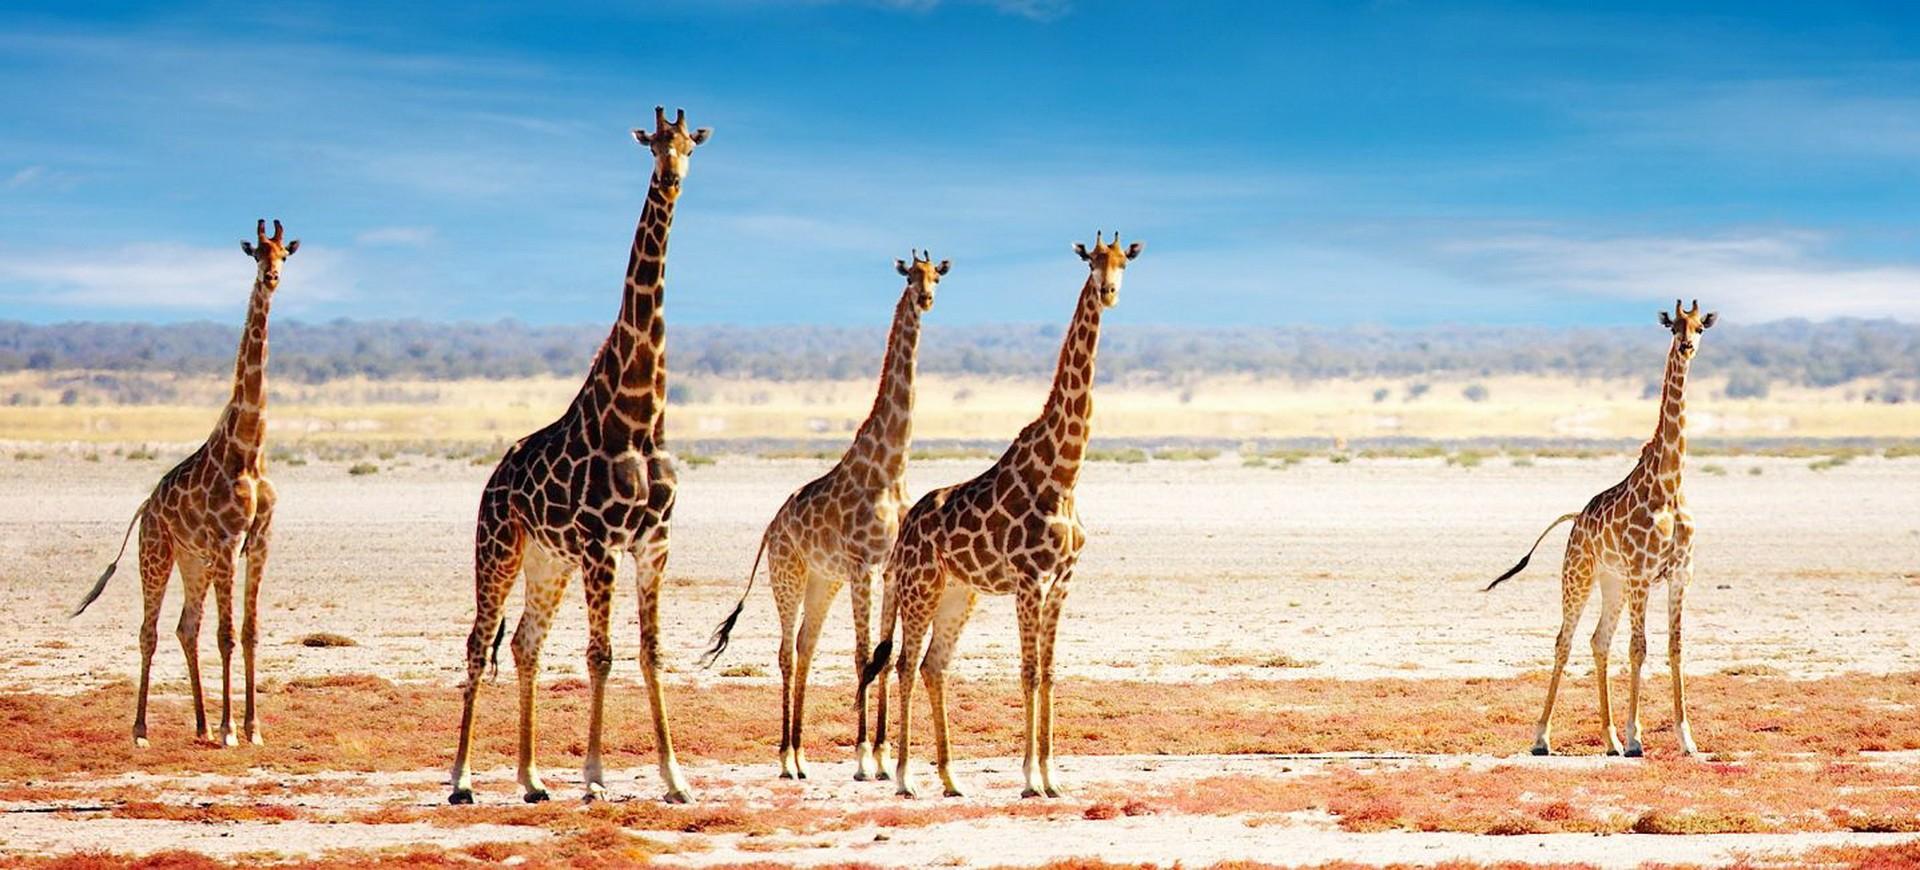 Namibie Parc national d'Etosha Girafes